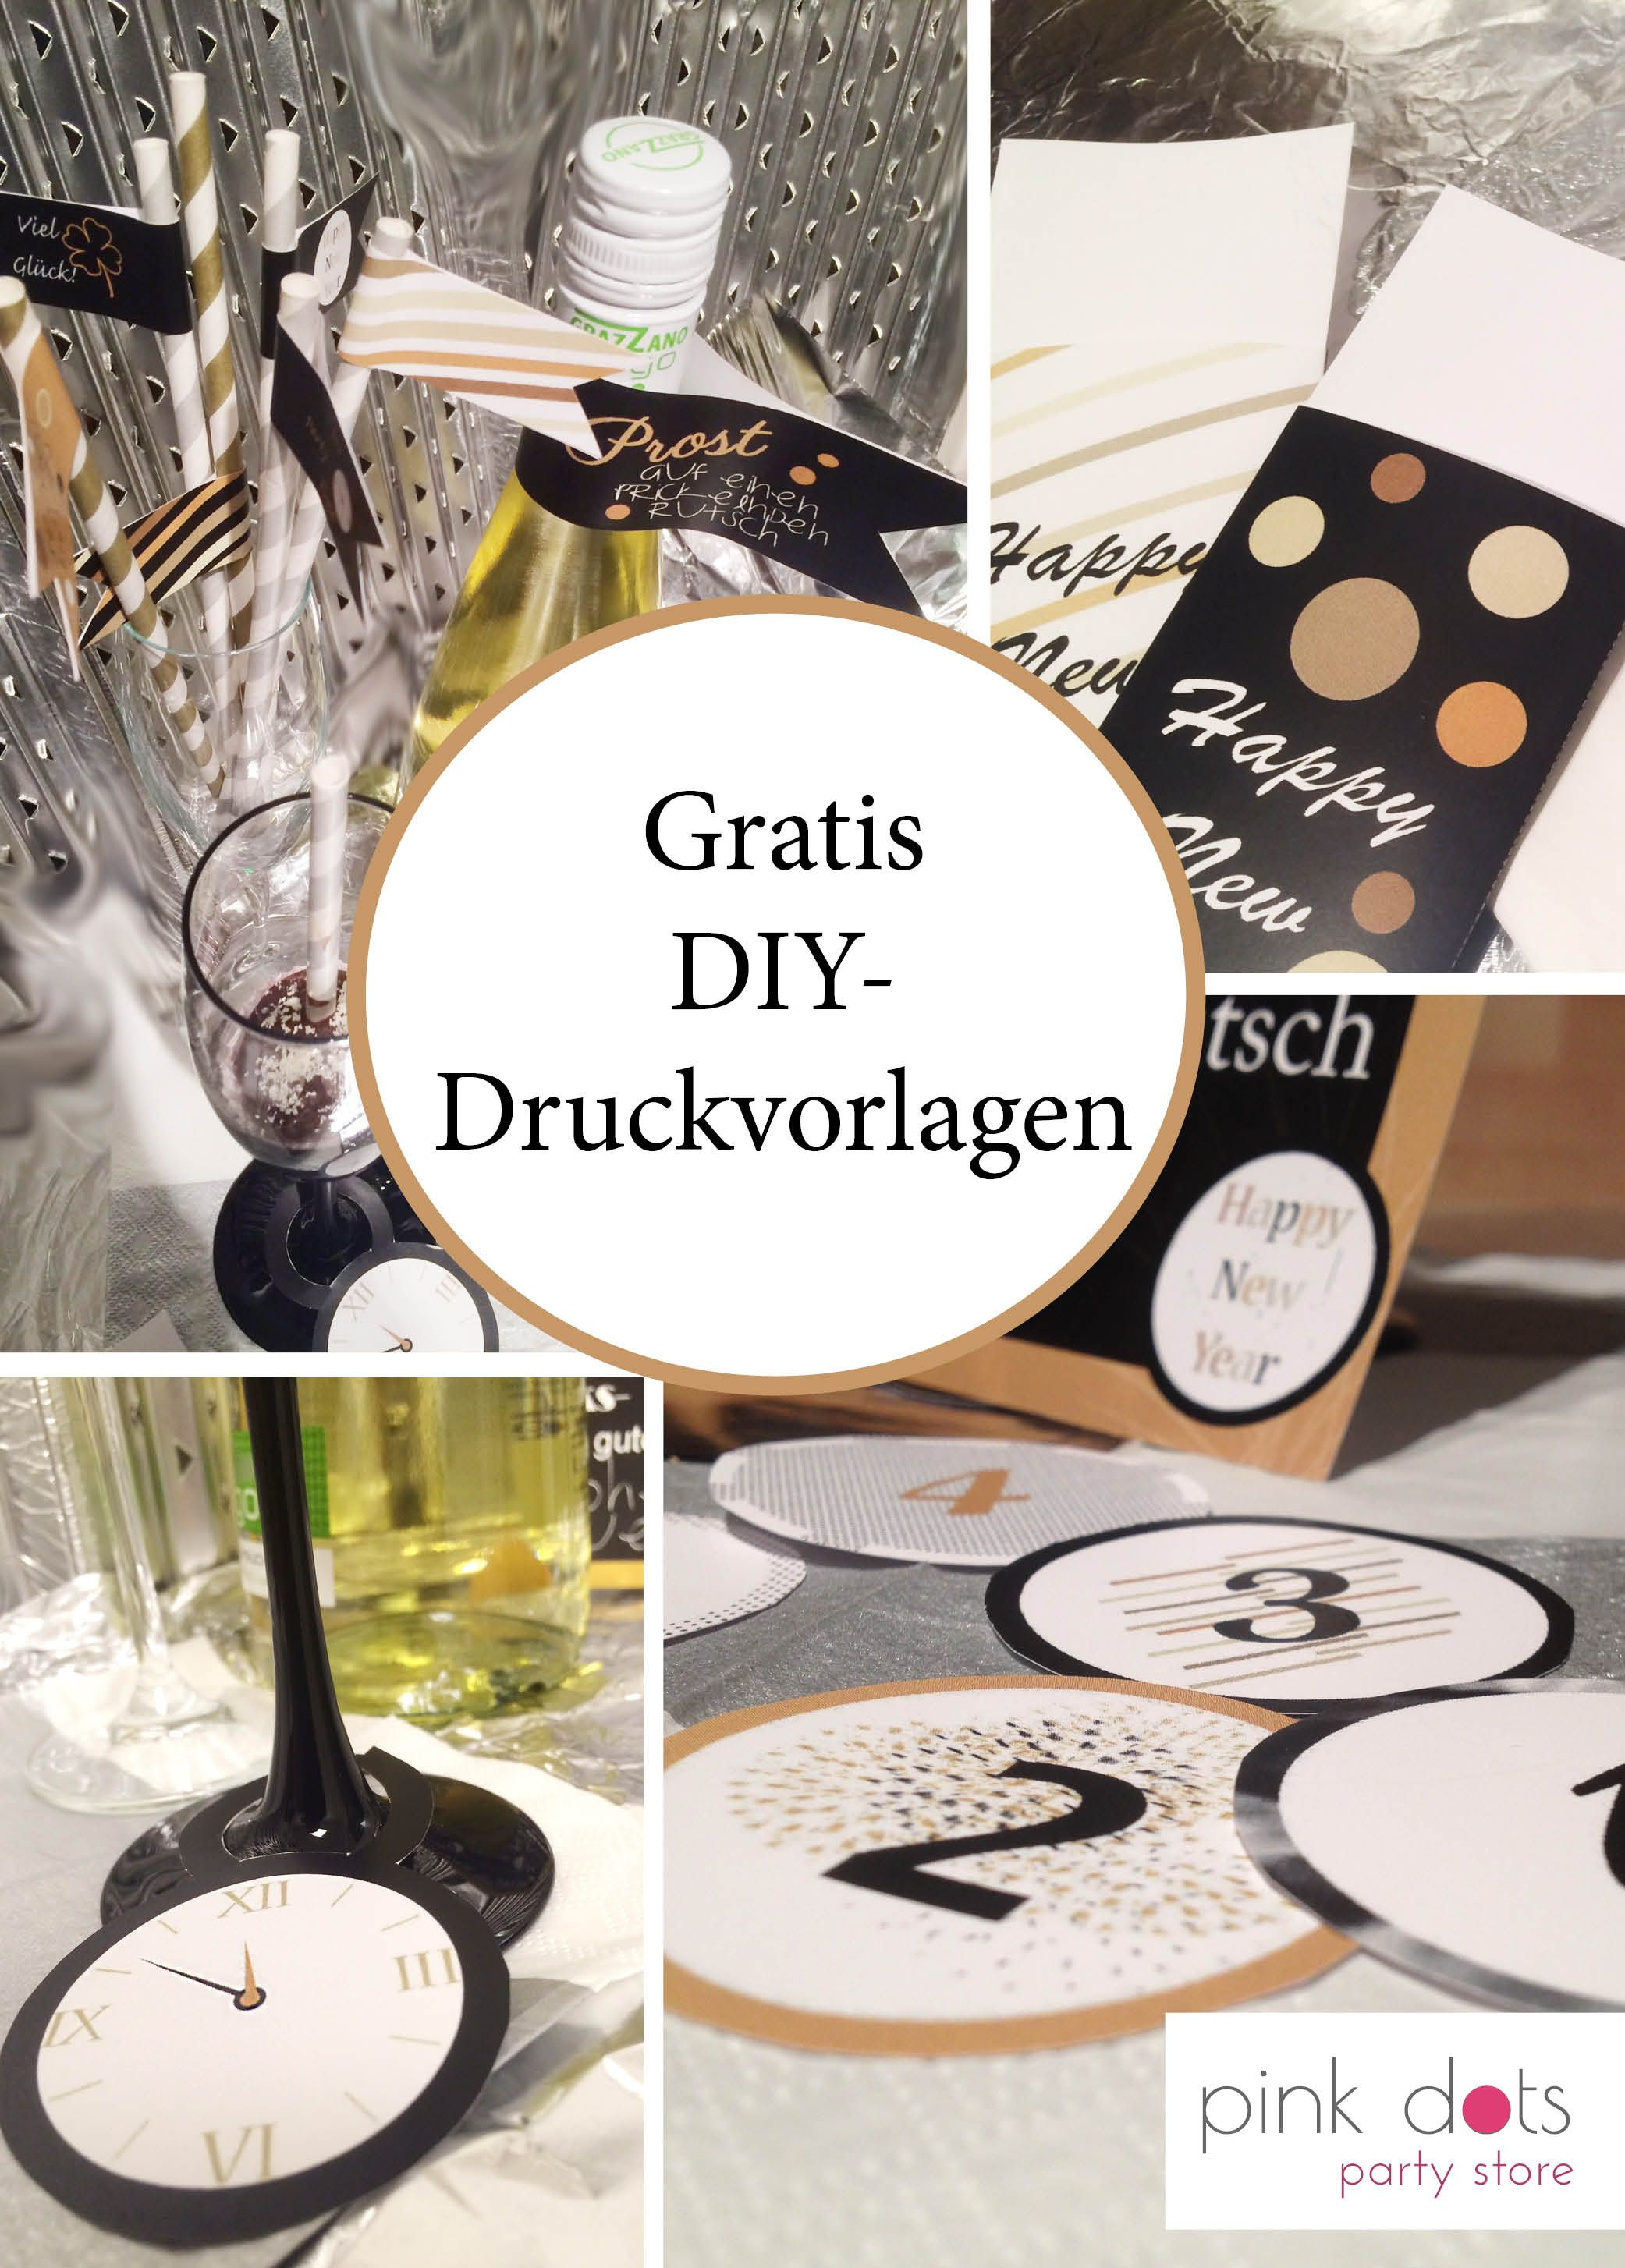 Silvester Partydeko und Accessoires | ☆ Silvester | Pinterest ...